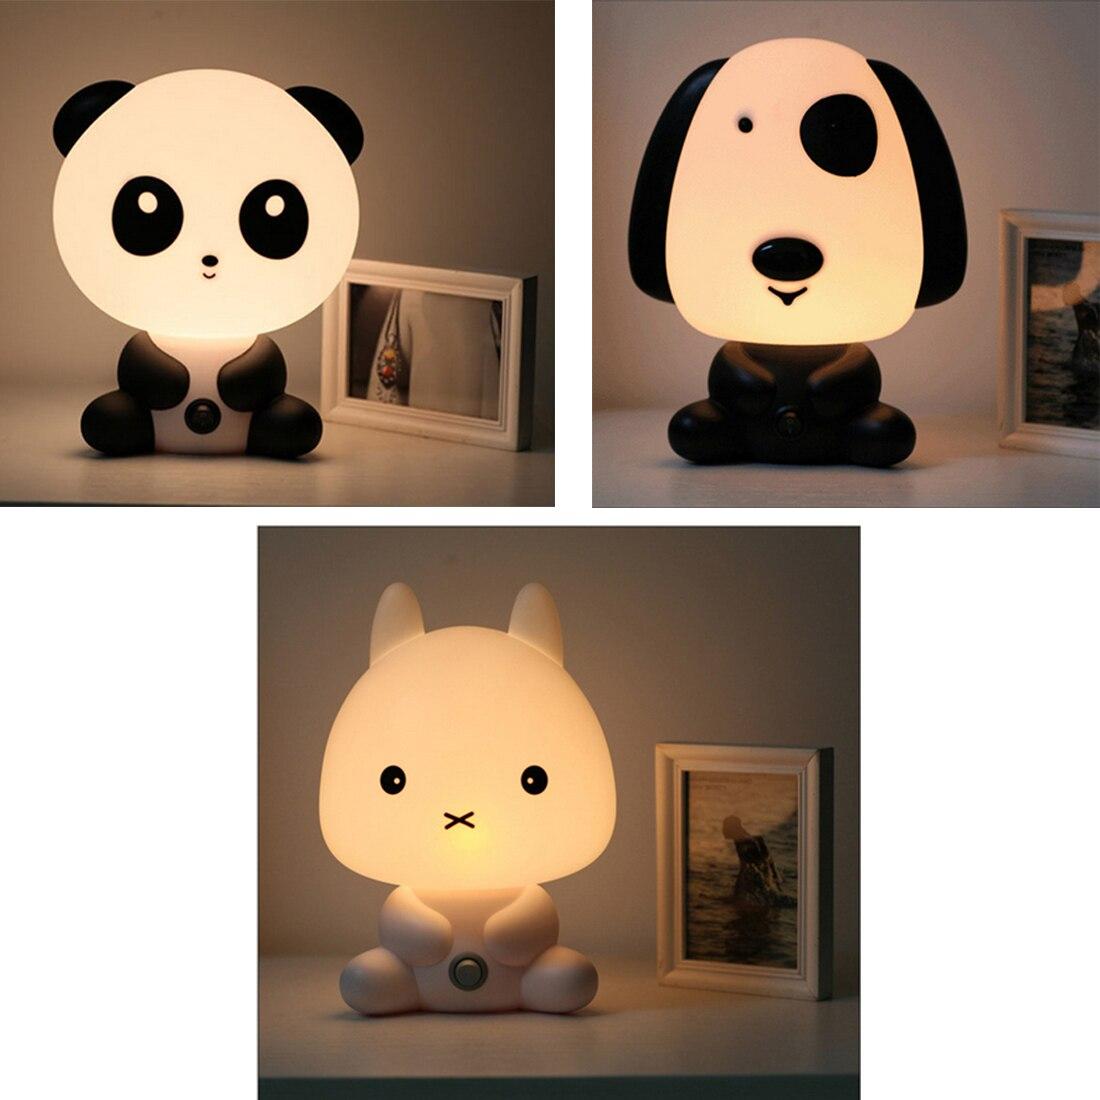 Hot!EU Plug Baby Bedroom Lamps Night Light Cartoon Pets Rabbit Panda PVC Plastic Sleep Led Kid Lamp Bulb Nightlight for Children